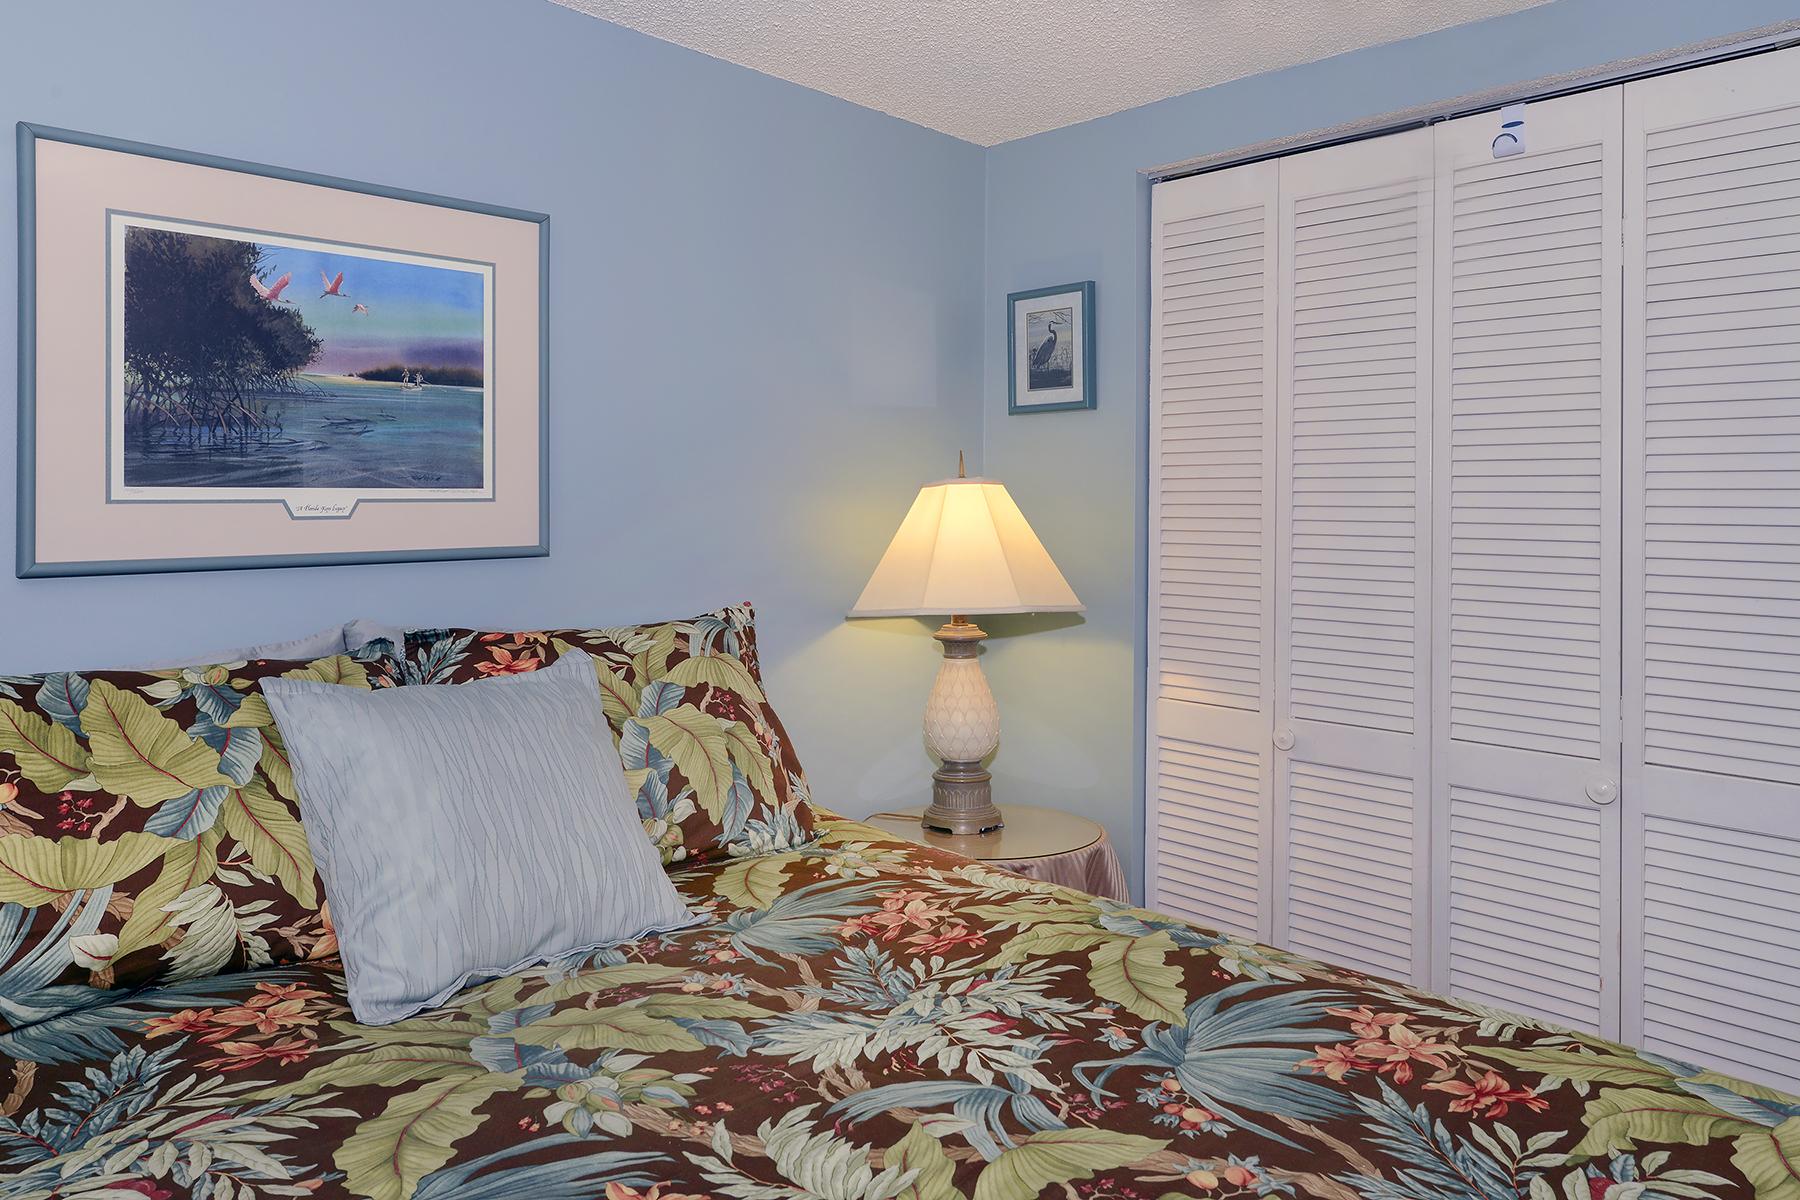 Additional photo for property listing at Sweeping Ocean Views 84 Seagate Blvd Key Largo, Florida 33037 Estados Unidos